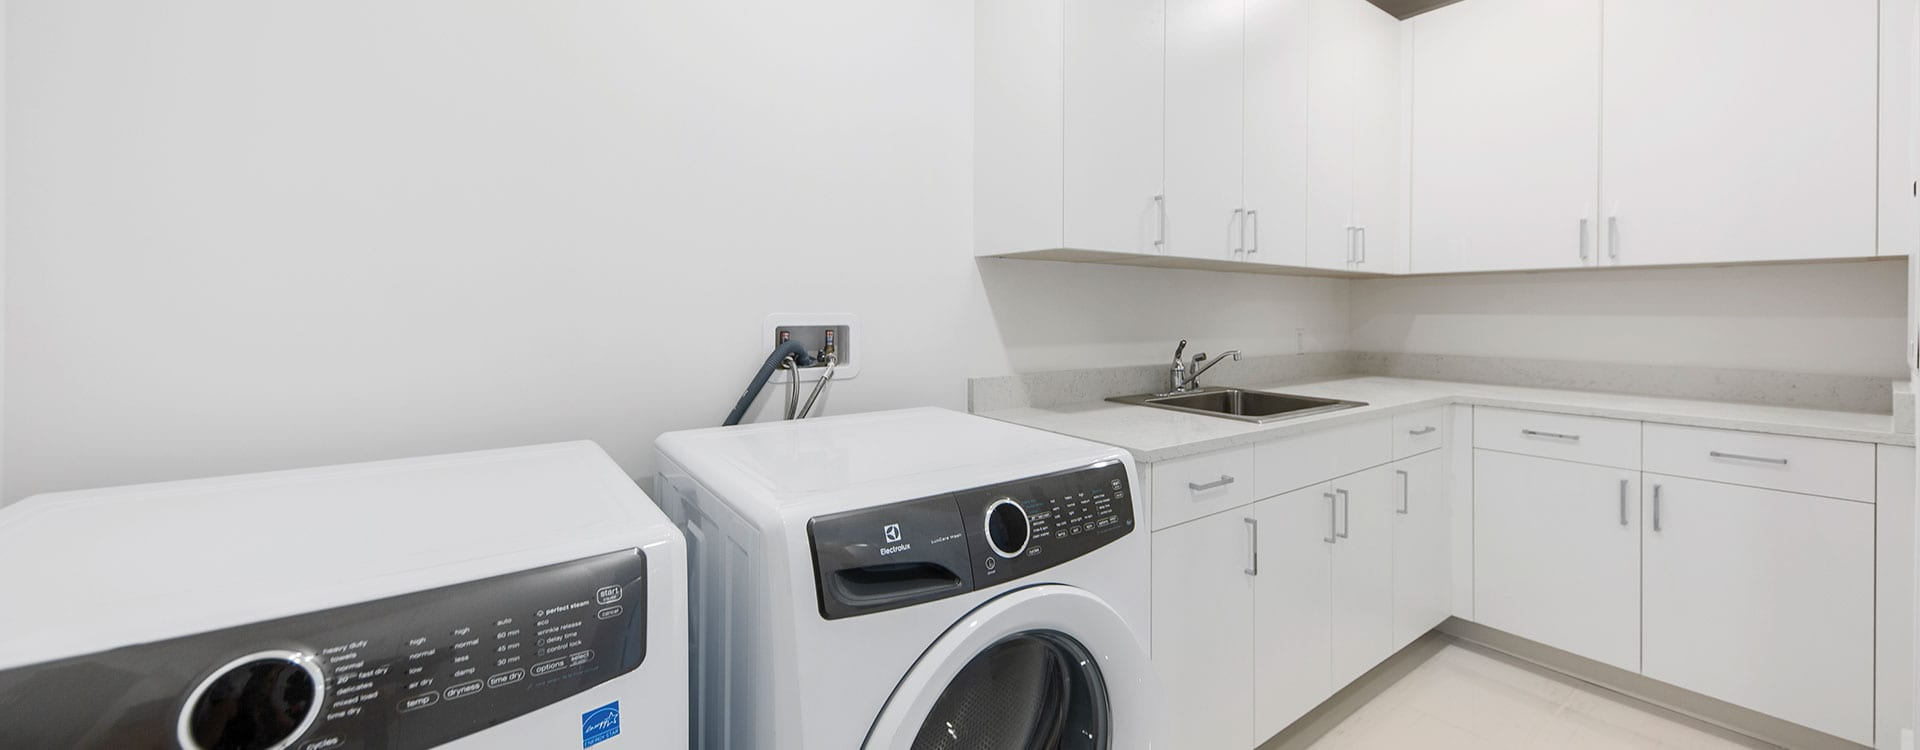 BLVD Residence 903 Laundry